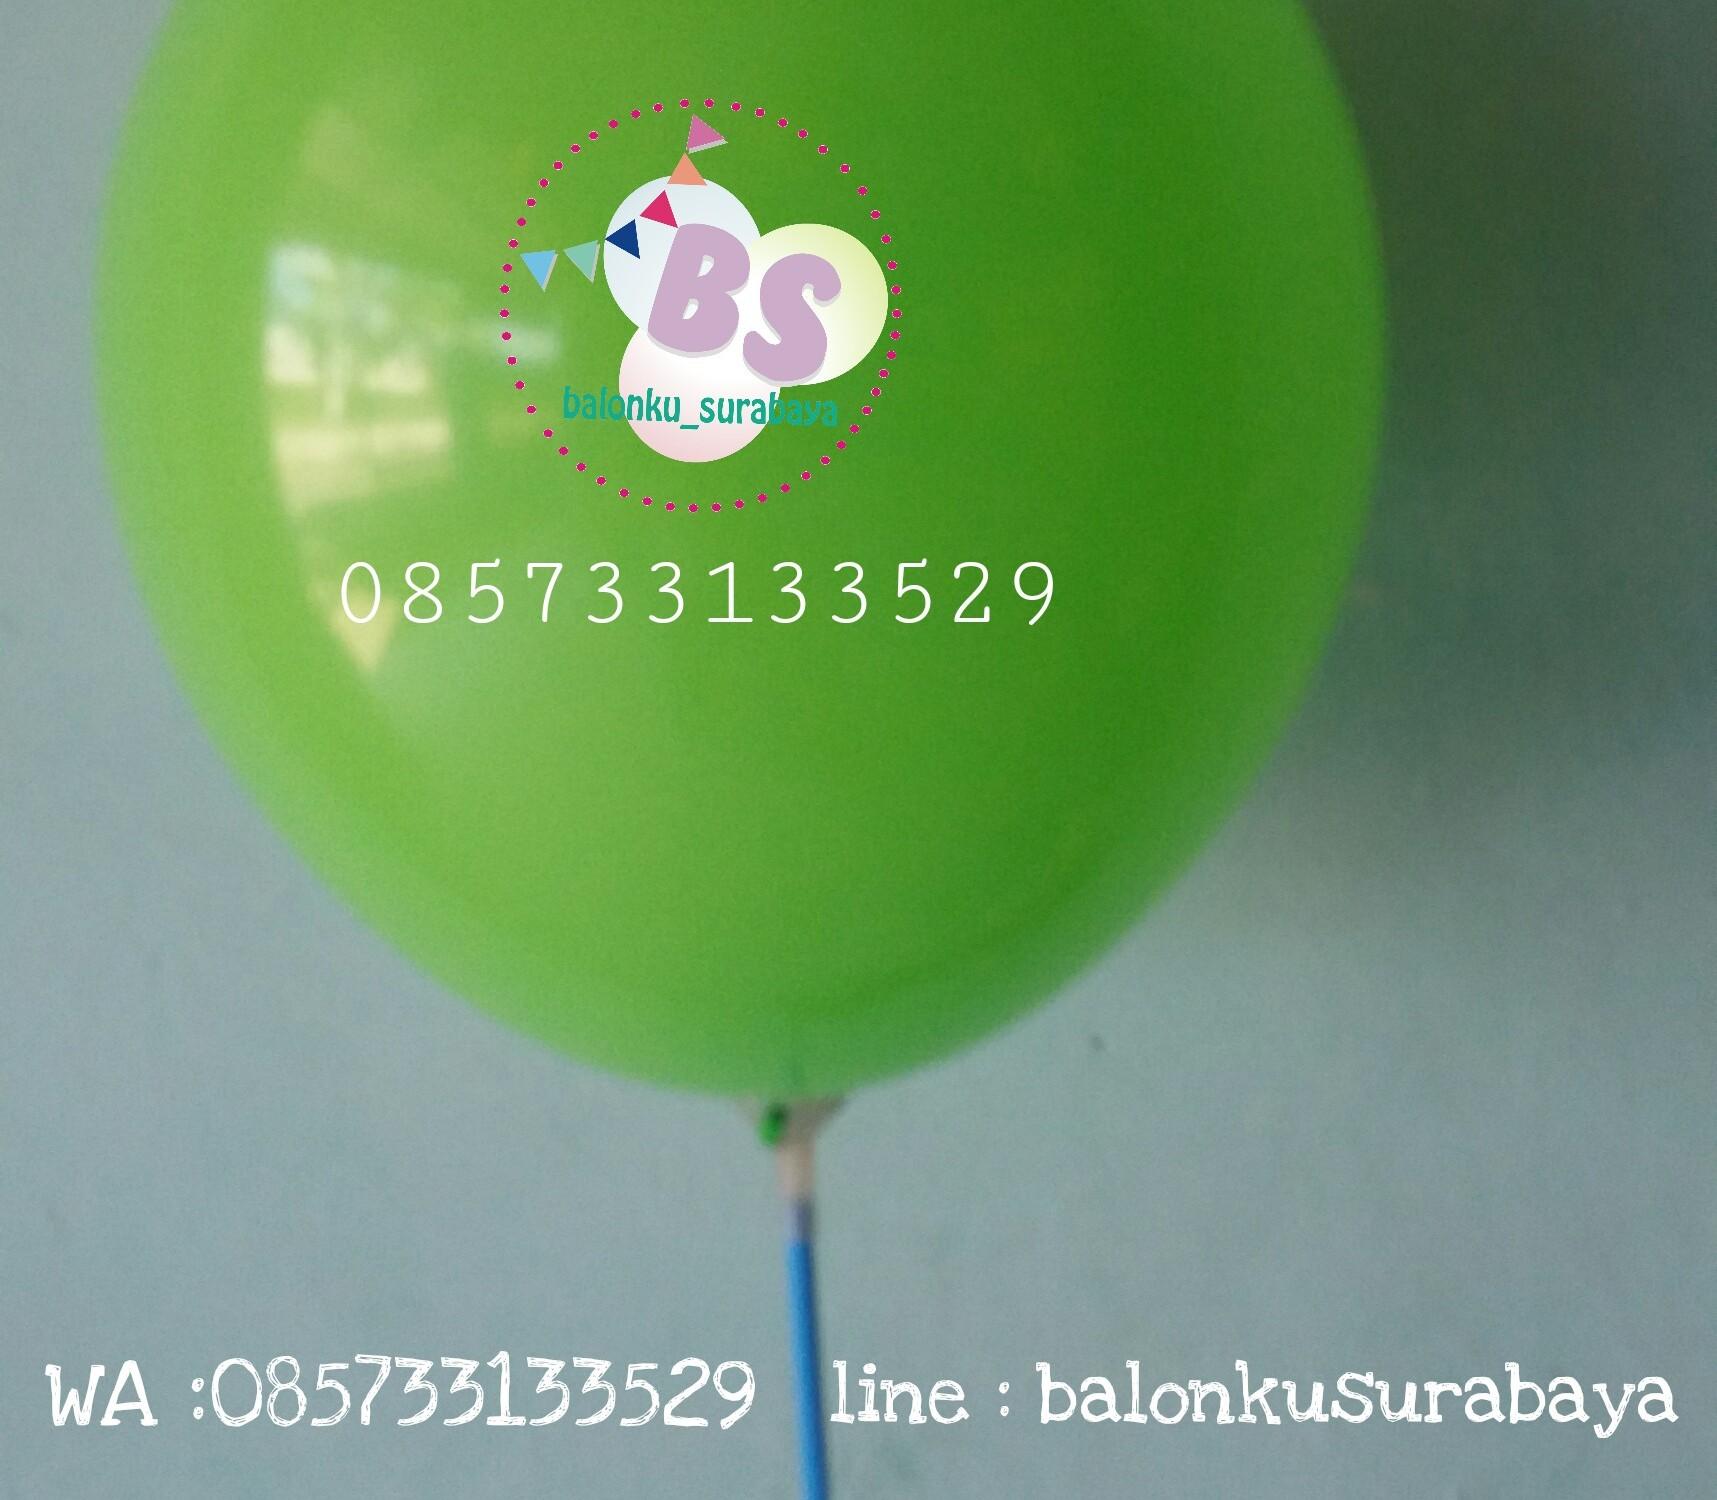 Balon crystal, balon doff, balon metalik, balon gas, balon dekorasi, balon surprise